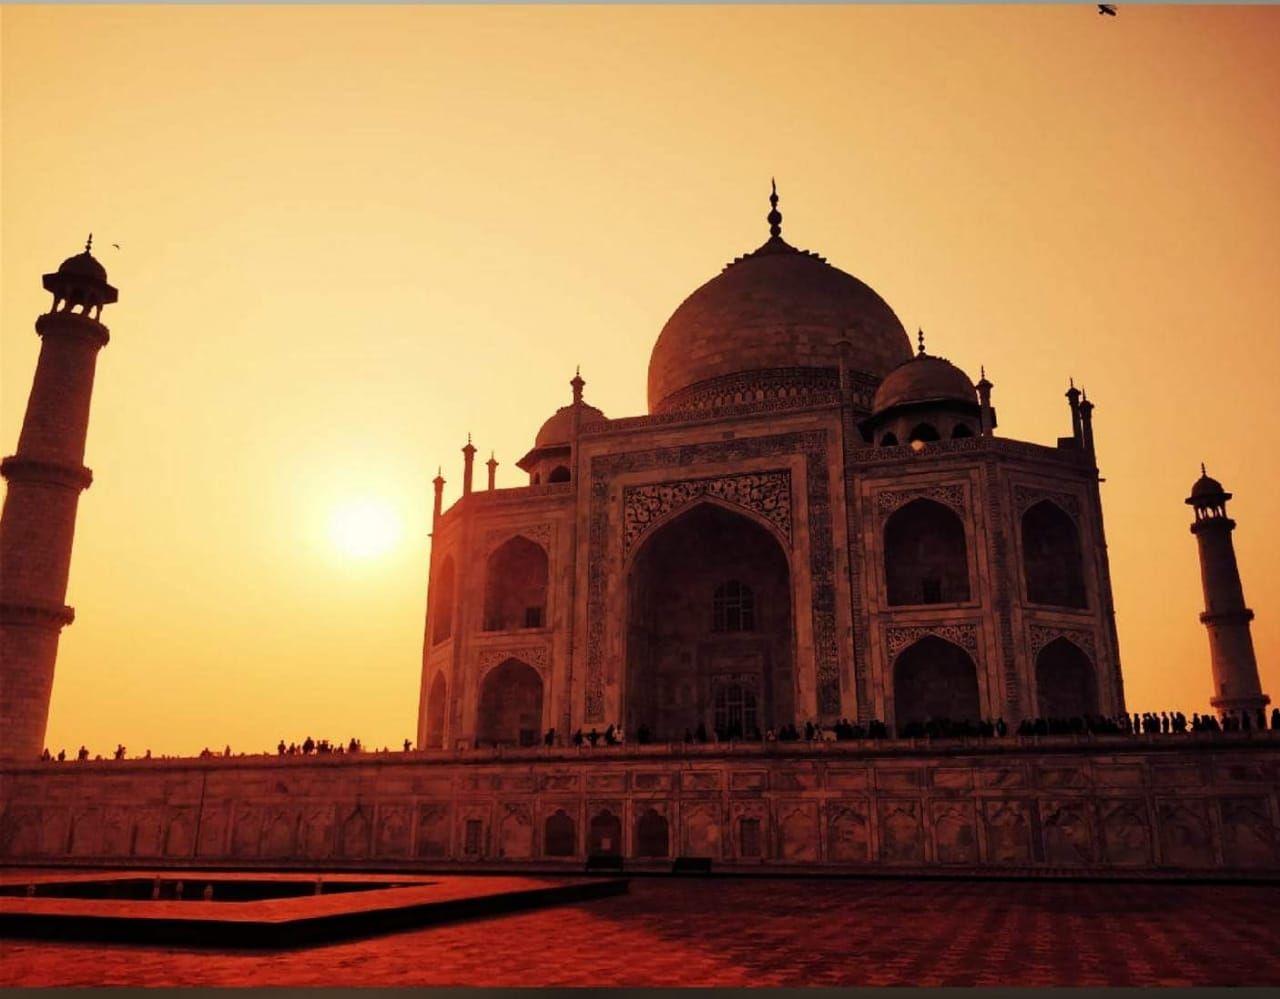 Photo of Agra By Prashant singh